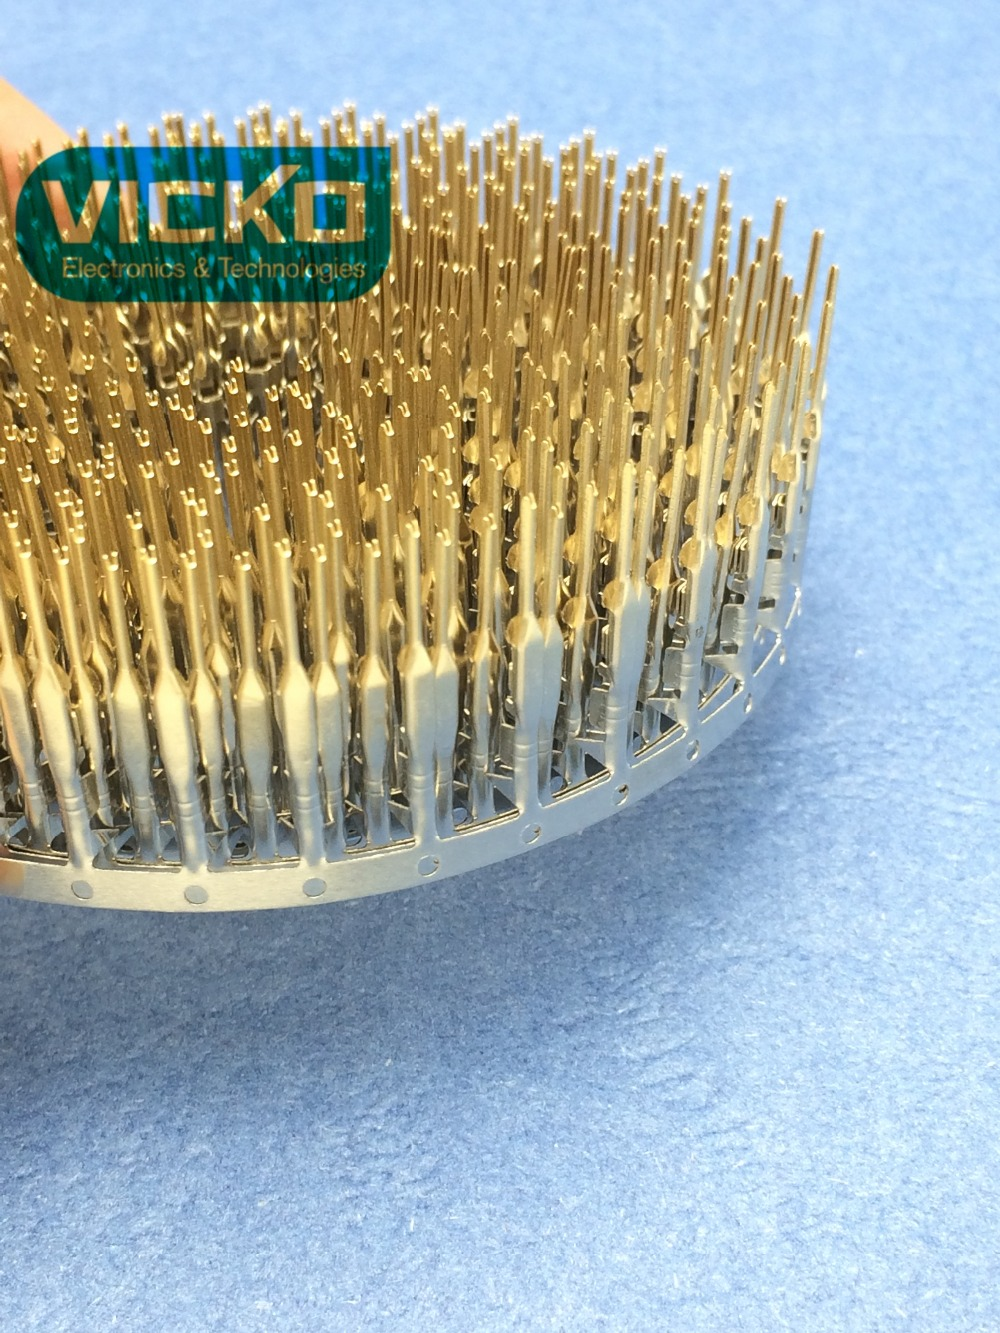 [VK]  1000pcs (500pcs Male +500pcs Female )  Pin Dupont Connector Gold Plated 2.54mm